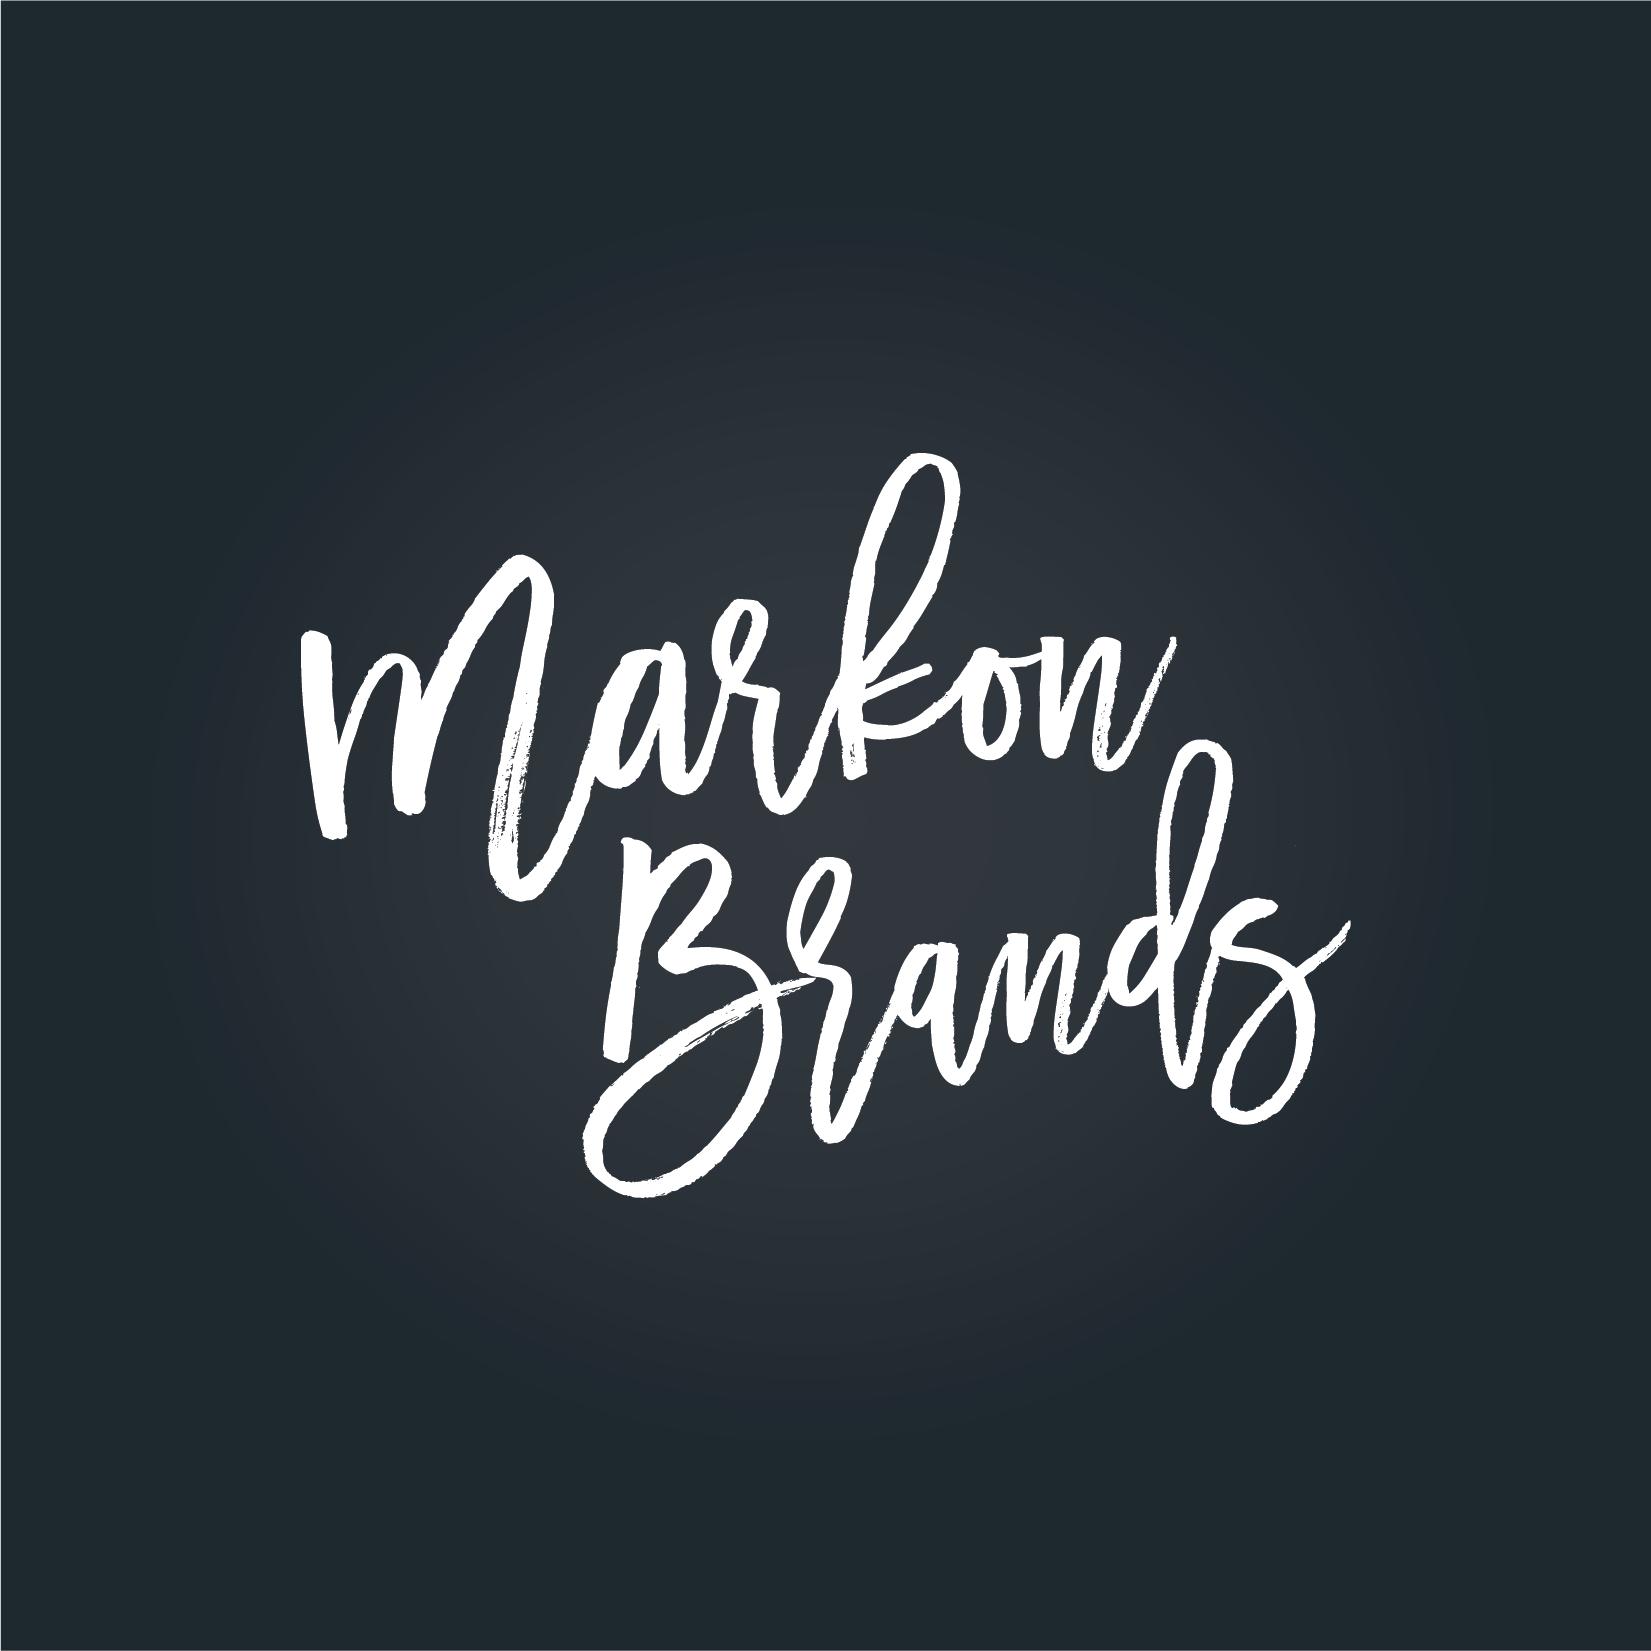 Website Designer in WA Vancouver 98660 Markon Brands 215 W 12th Street Suite 201 (360)695-5368